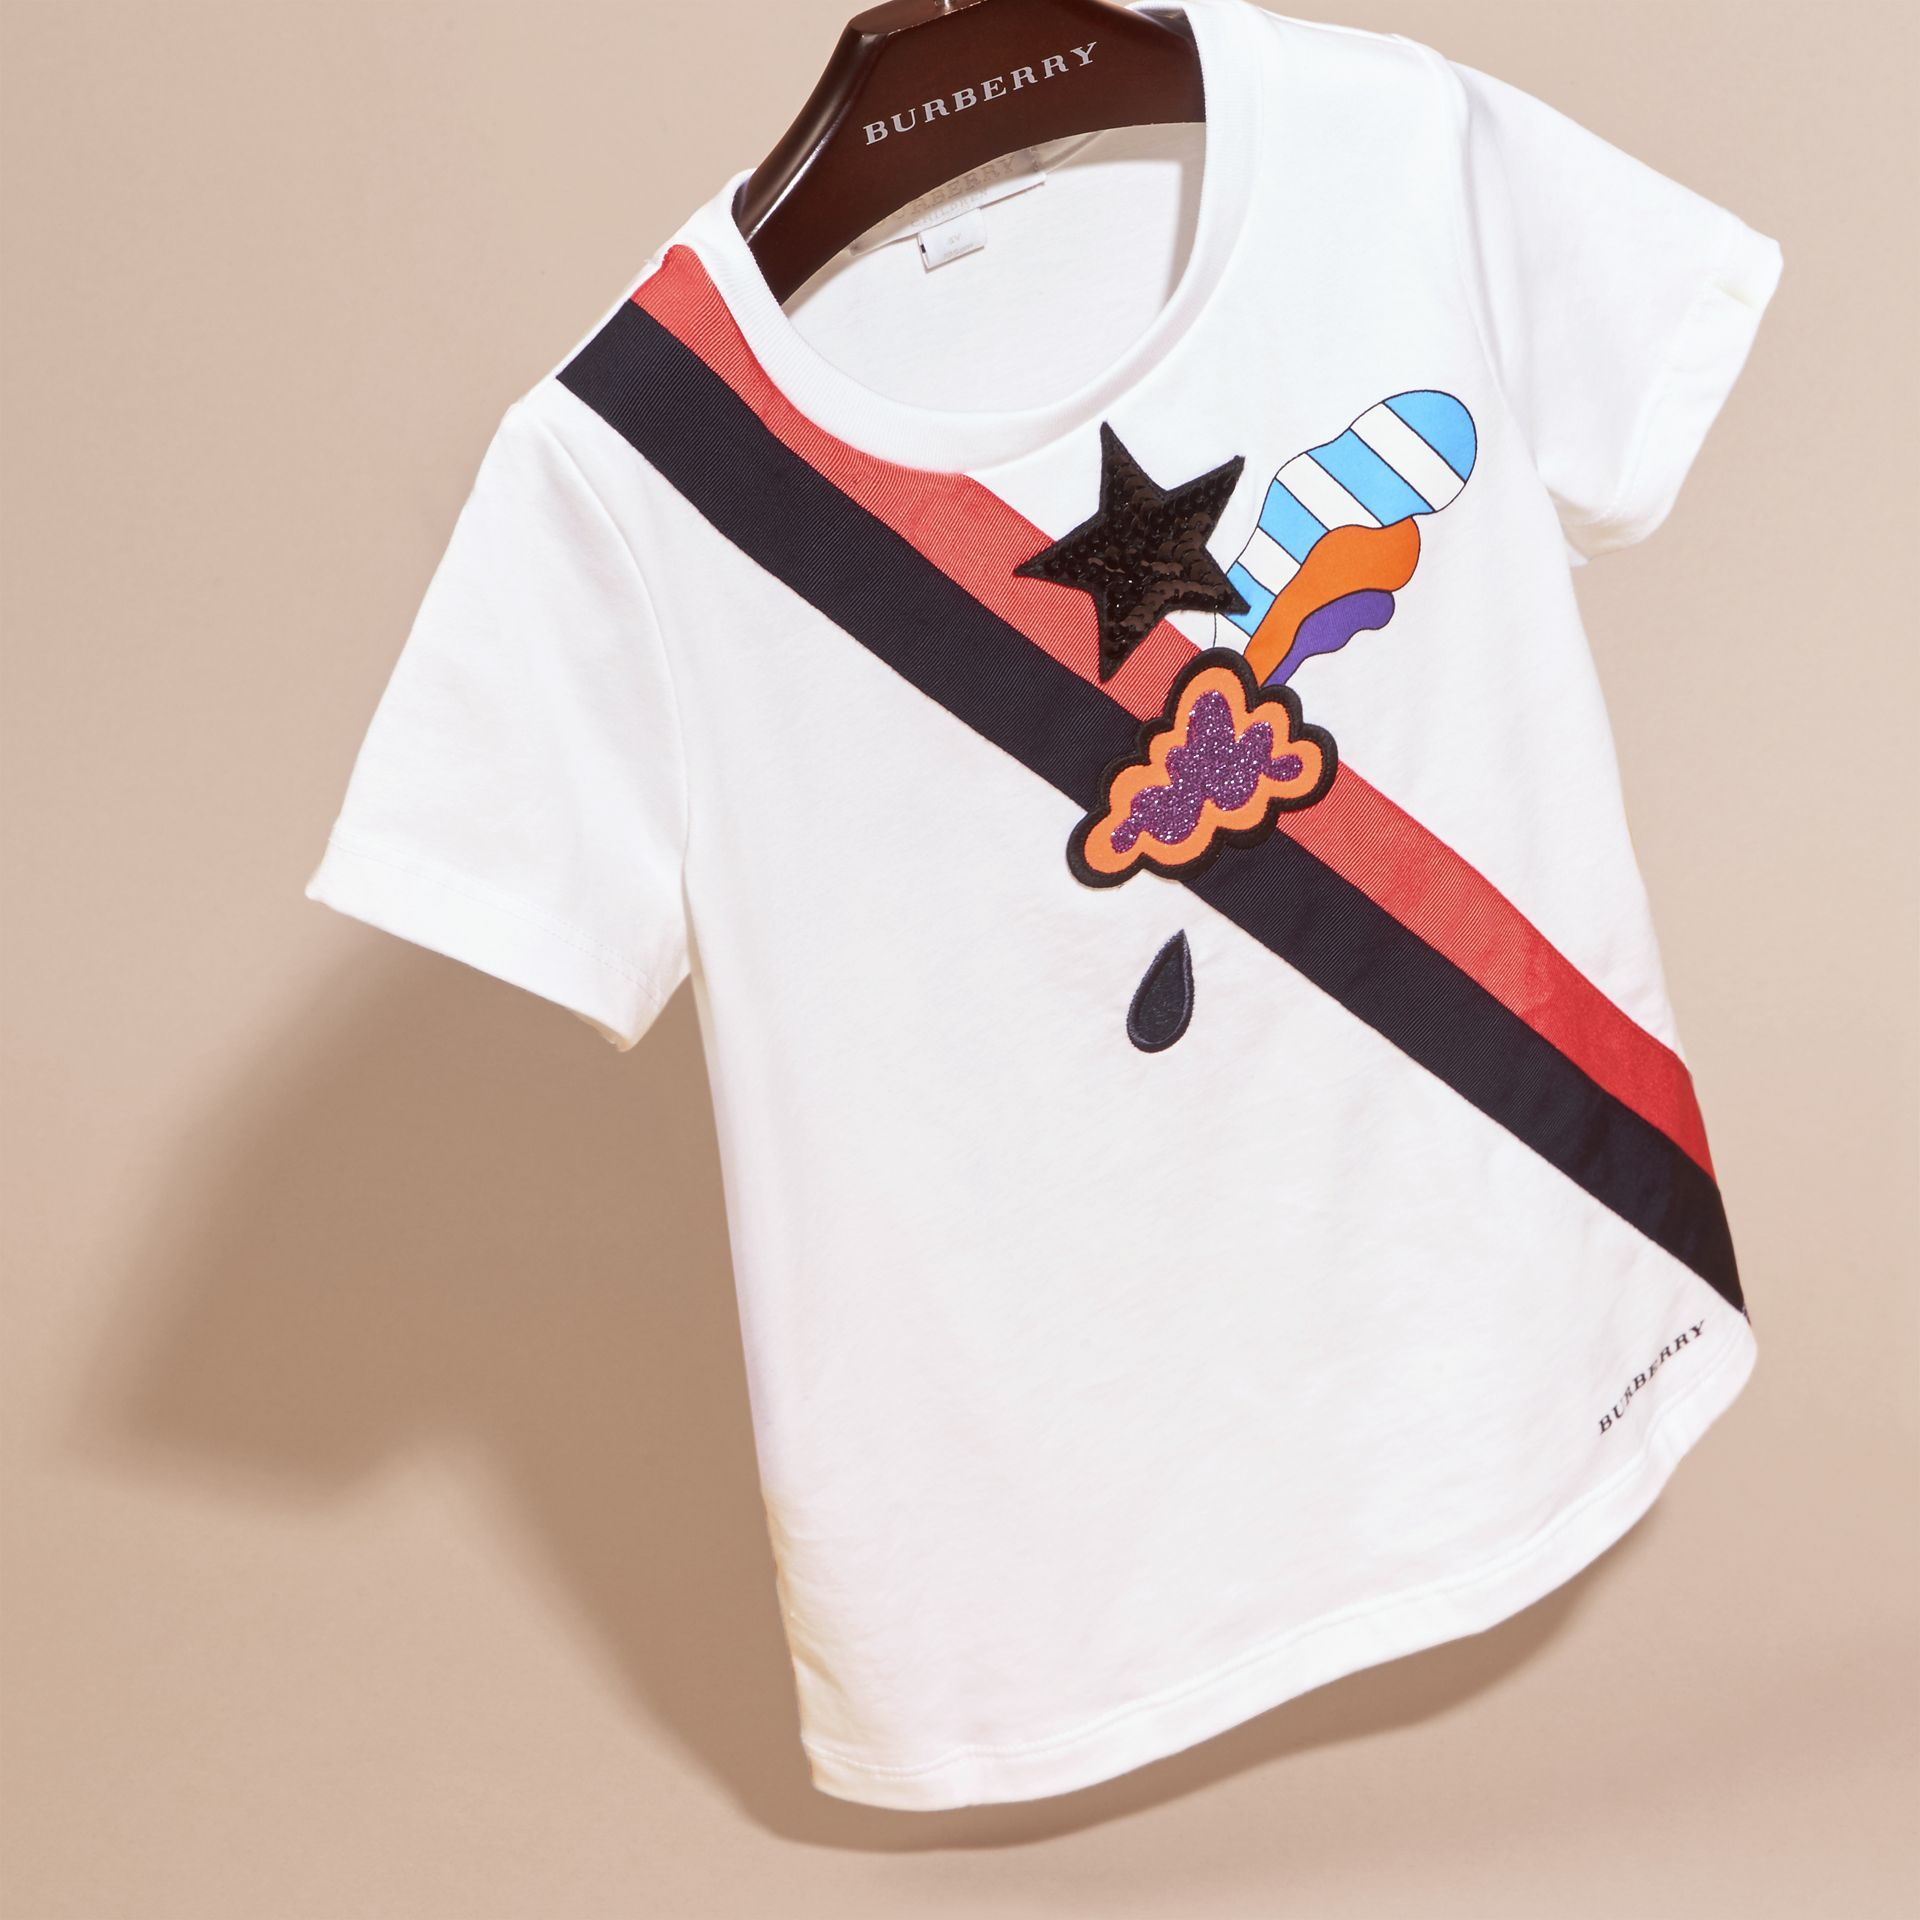 Sequin Appliquéd Weather Graphic Cotton T-Shirt - gallery image 3